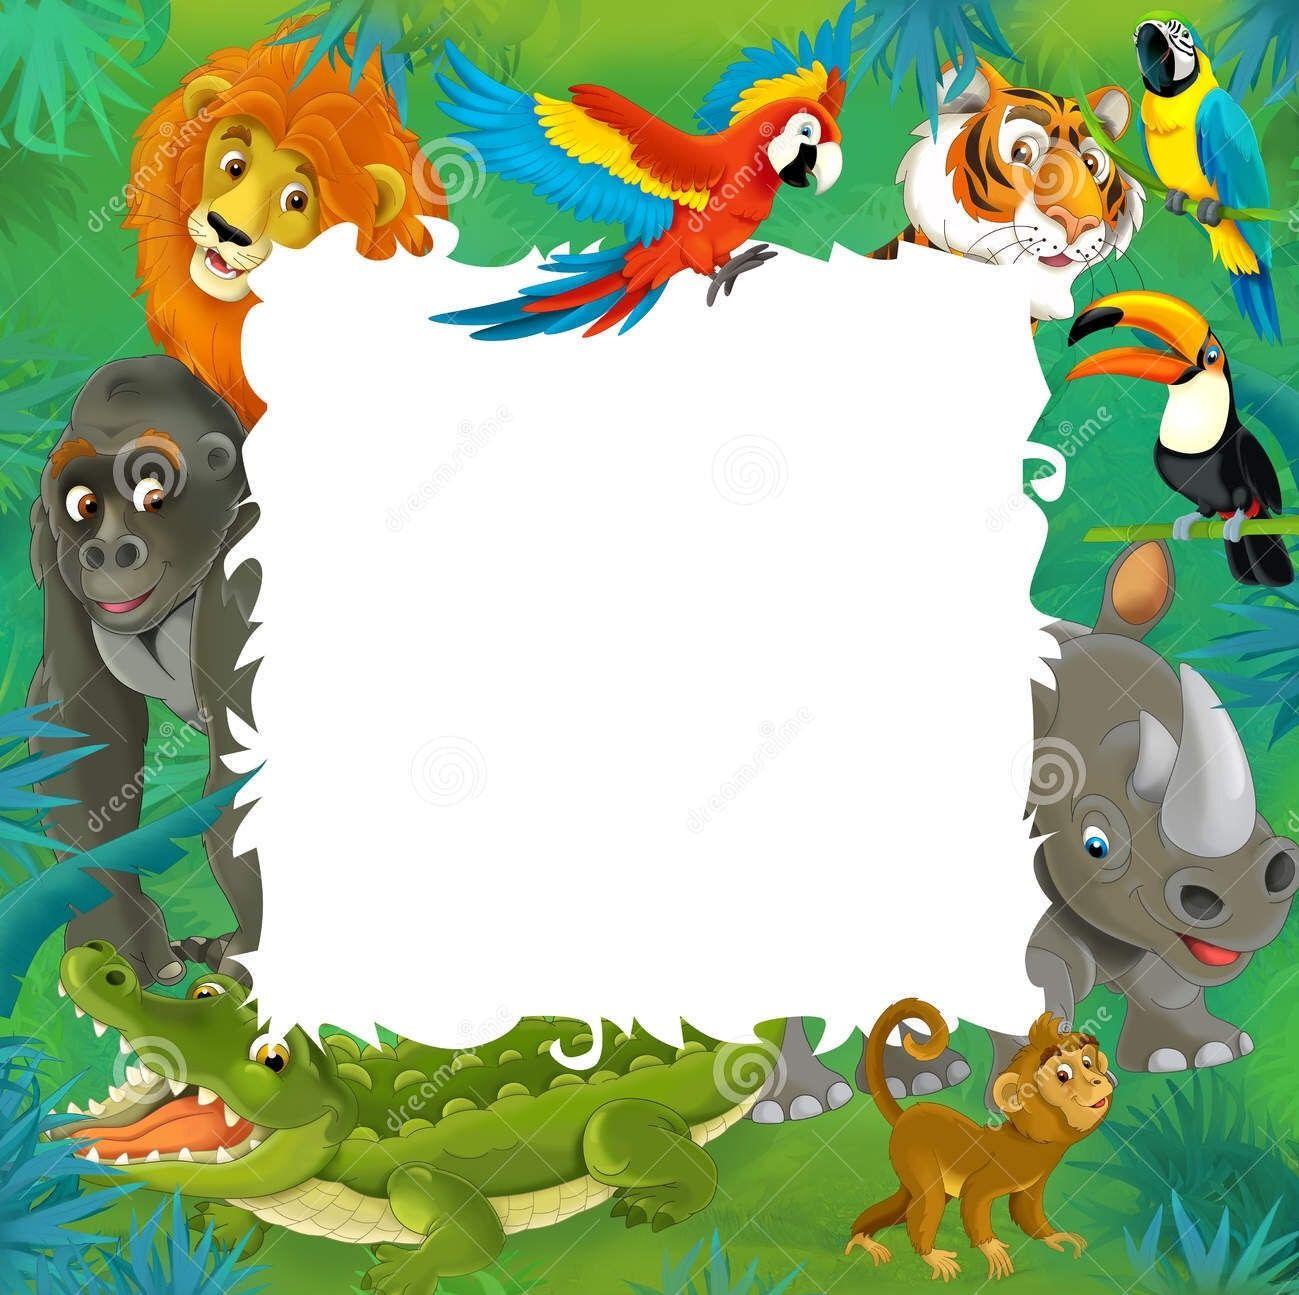 Dreamstime Jungle Animals Pictures Jungle Crafts Jungle Animals